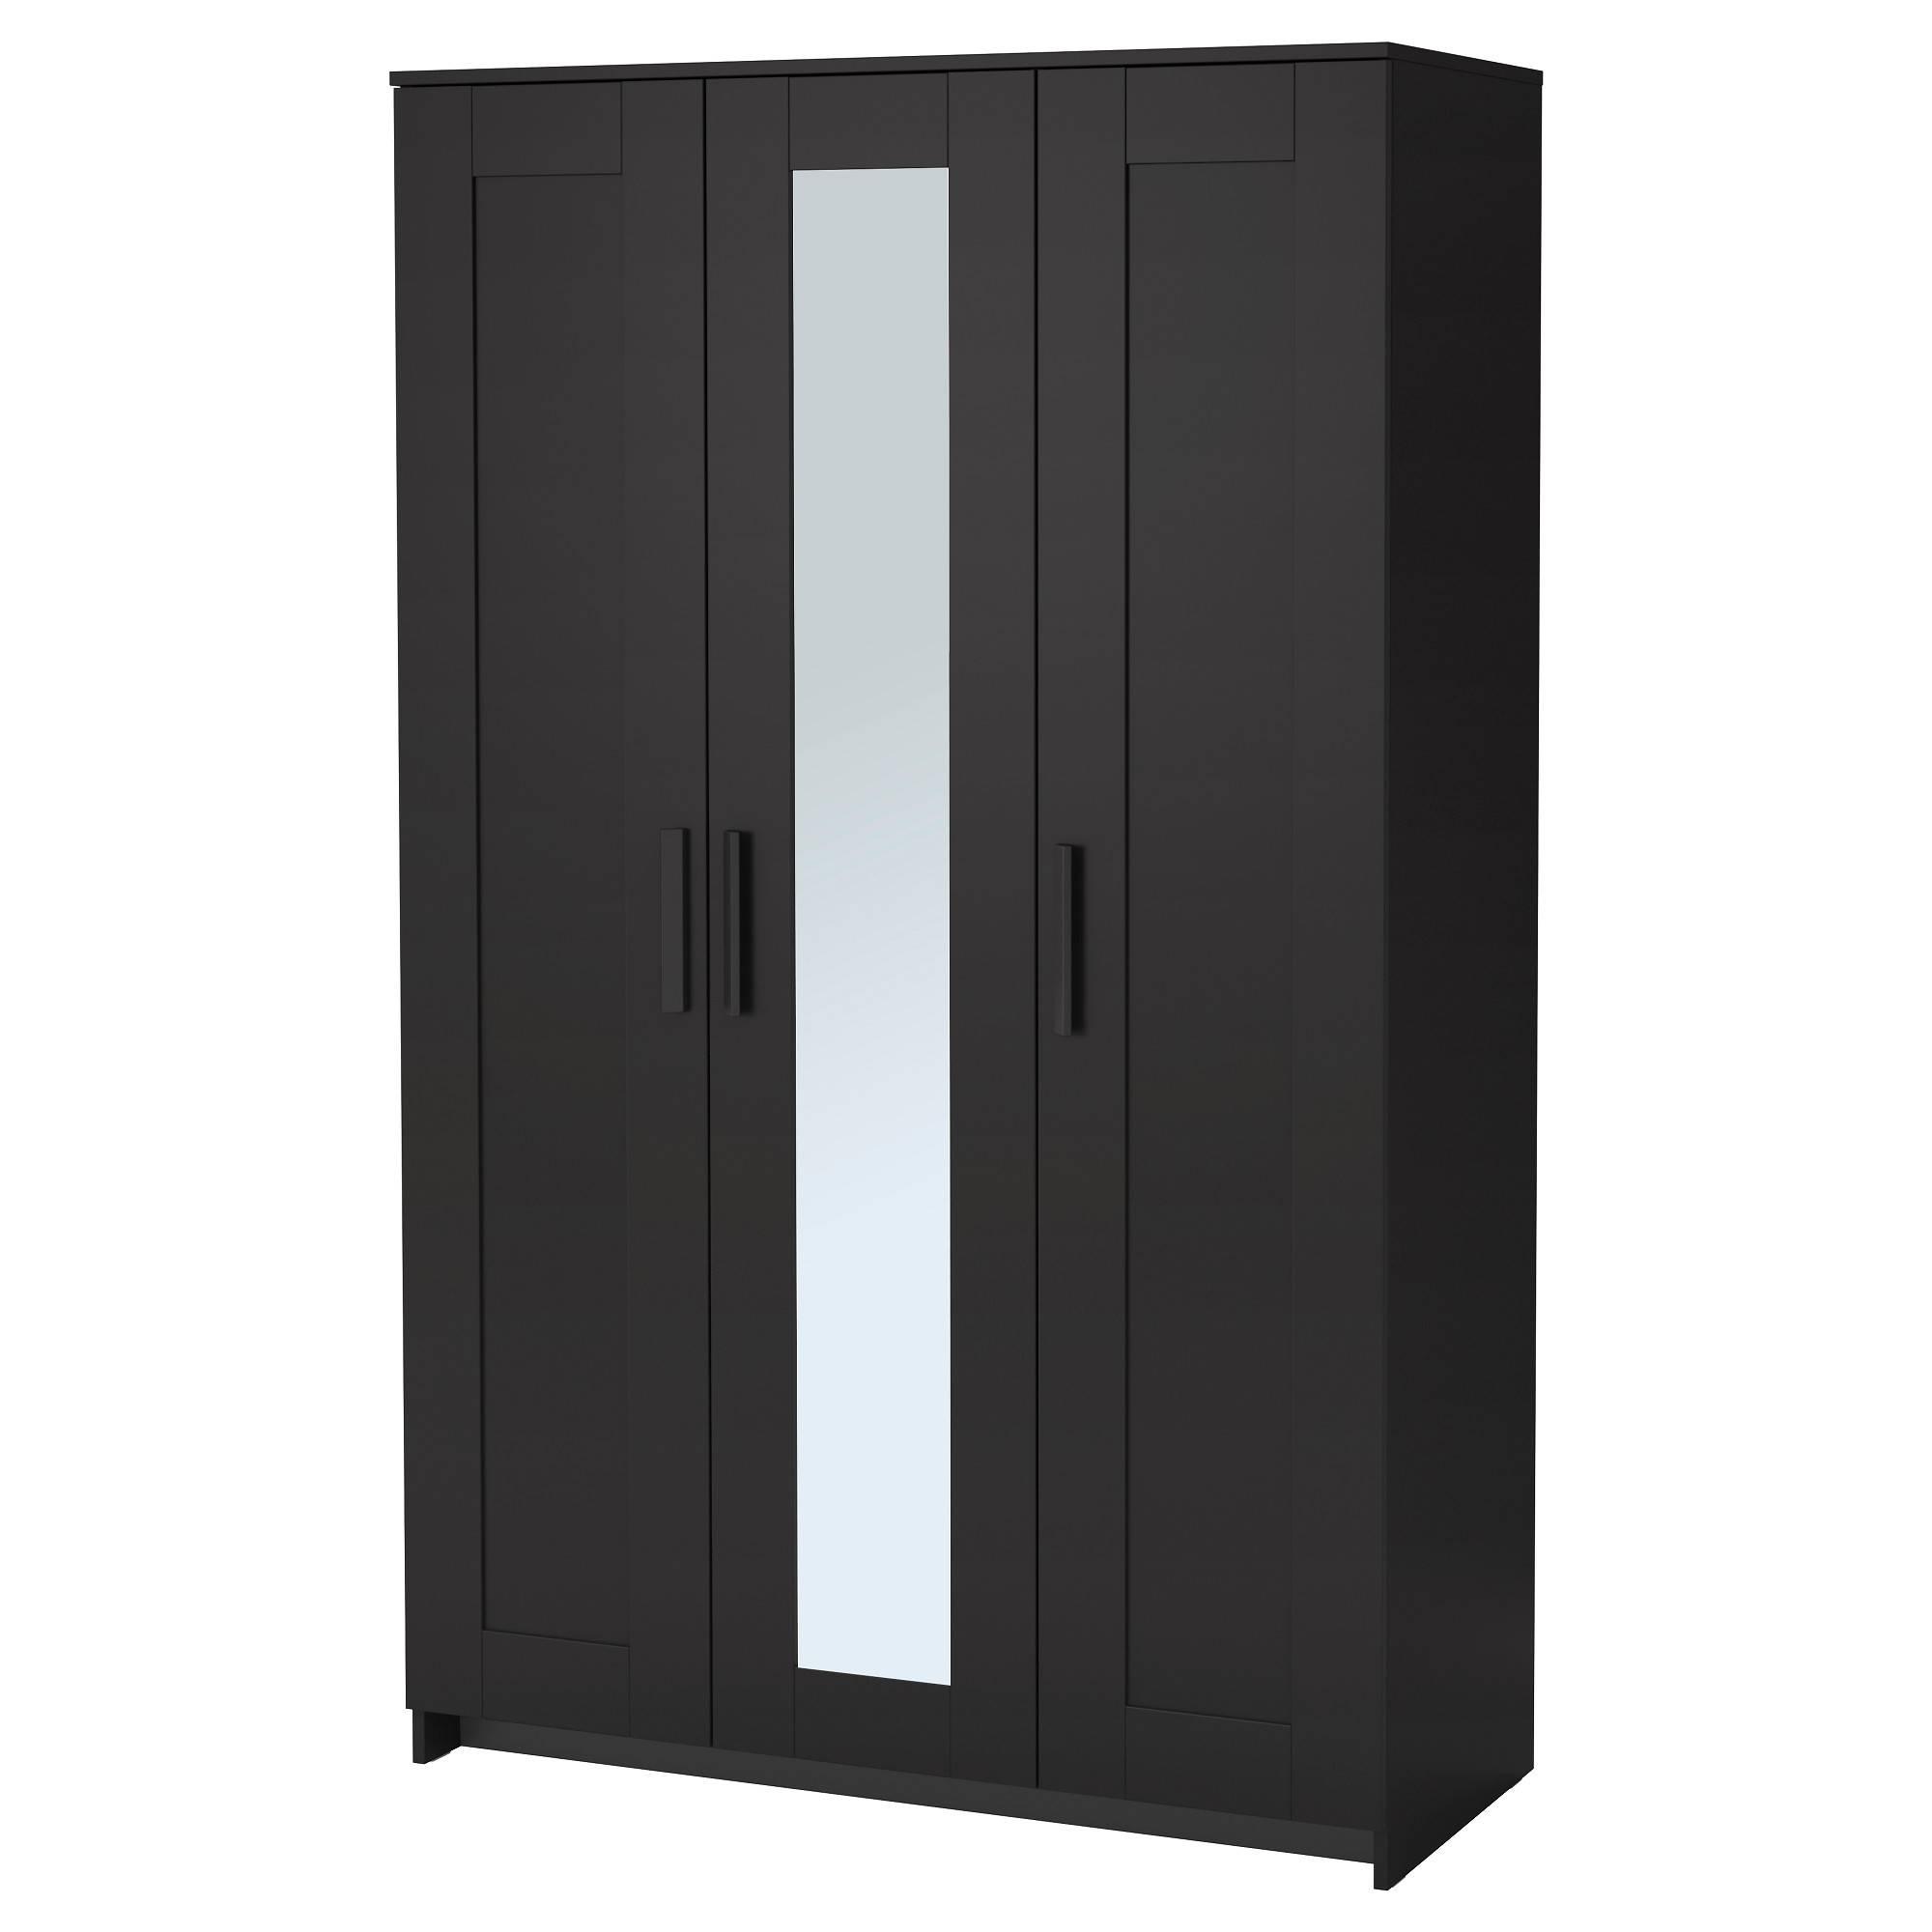 Brimnes Wardrobe With 3 Doors - White - Ikea throughout Dark Wood Wardrobes Ikea (Image 5 of 30)